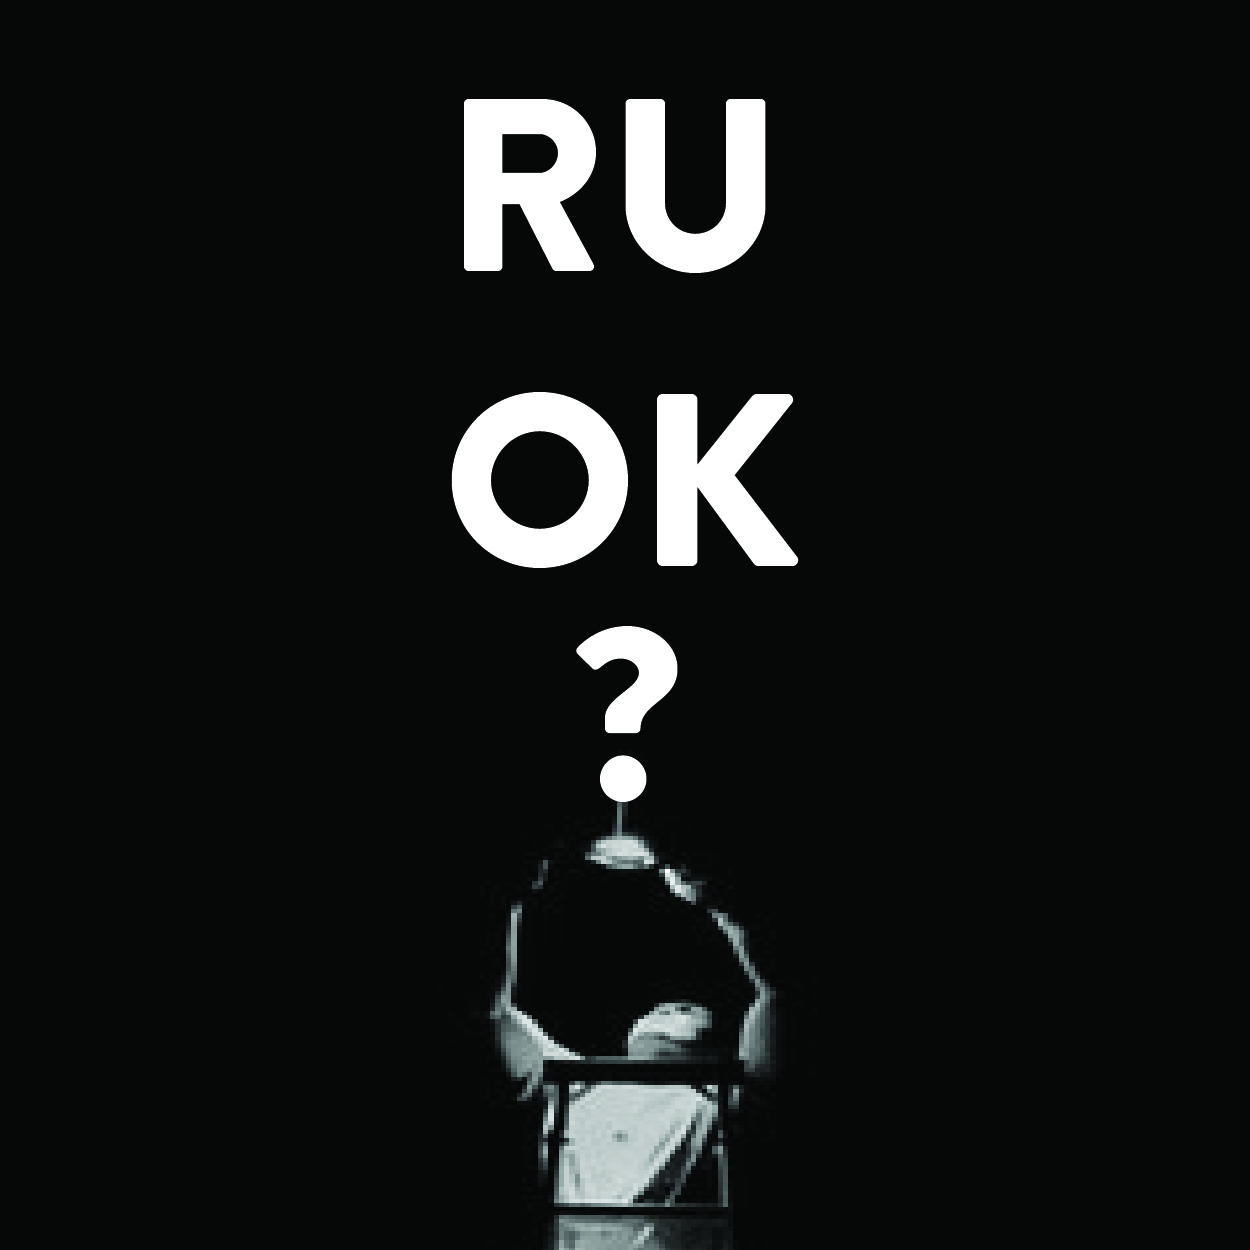 RUOK-01.jpg